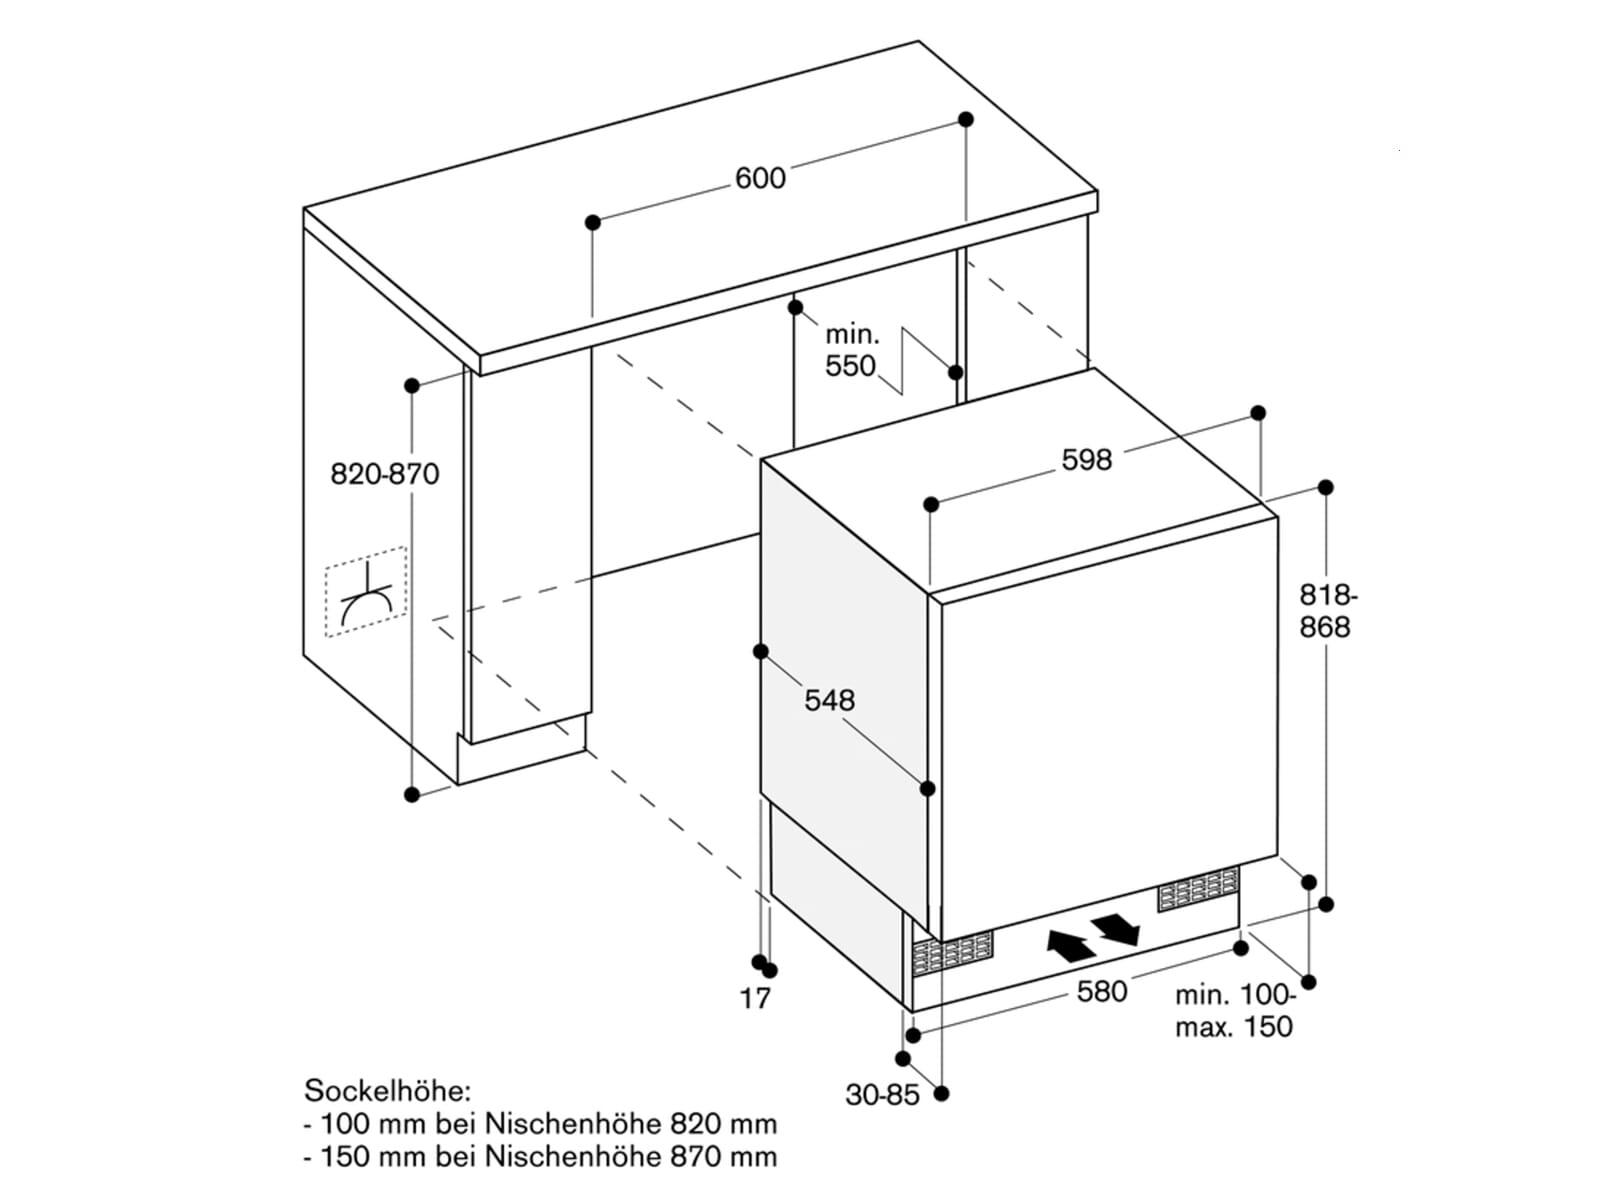 Gaggenau RC 200 202 Serie 200 Unterbaukühlschrank